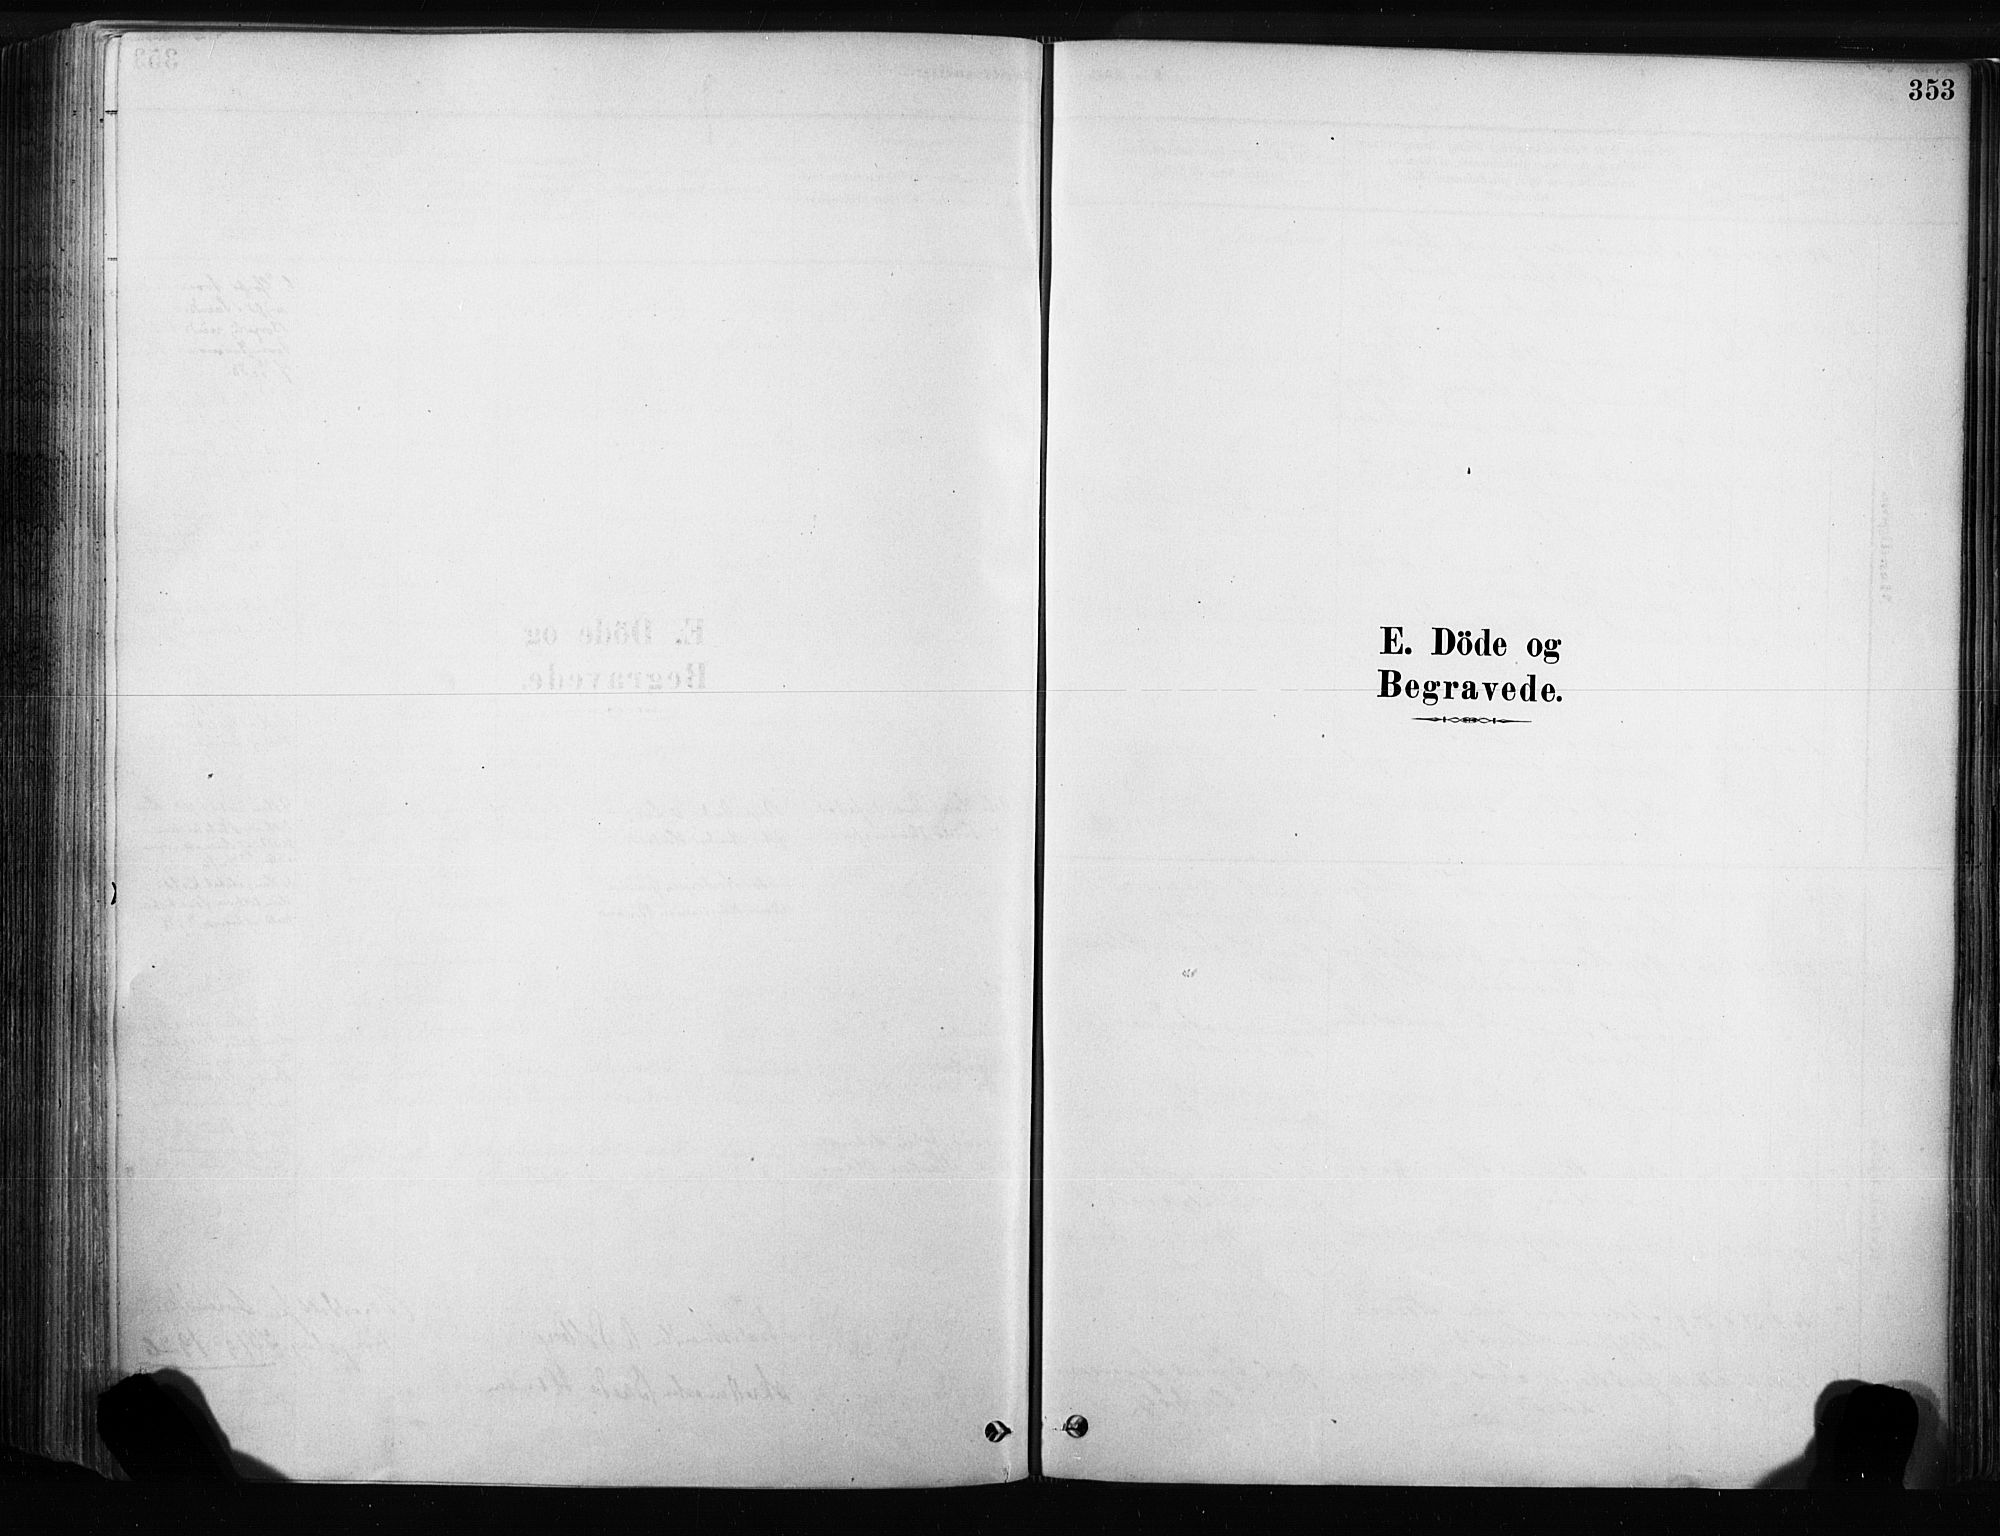 SAKO, Sandsvær kirkebøker, F/Fb/L0001: Ministerialbok nr. II 1, 1878-1906, s. 353